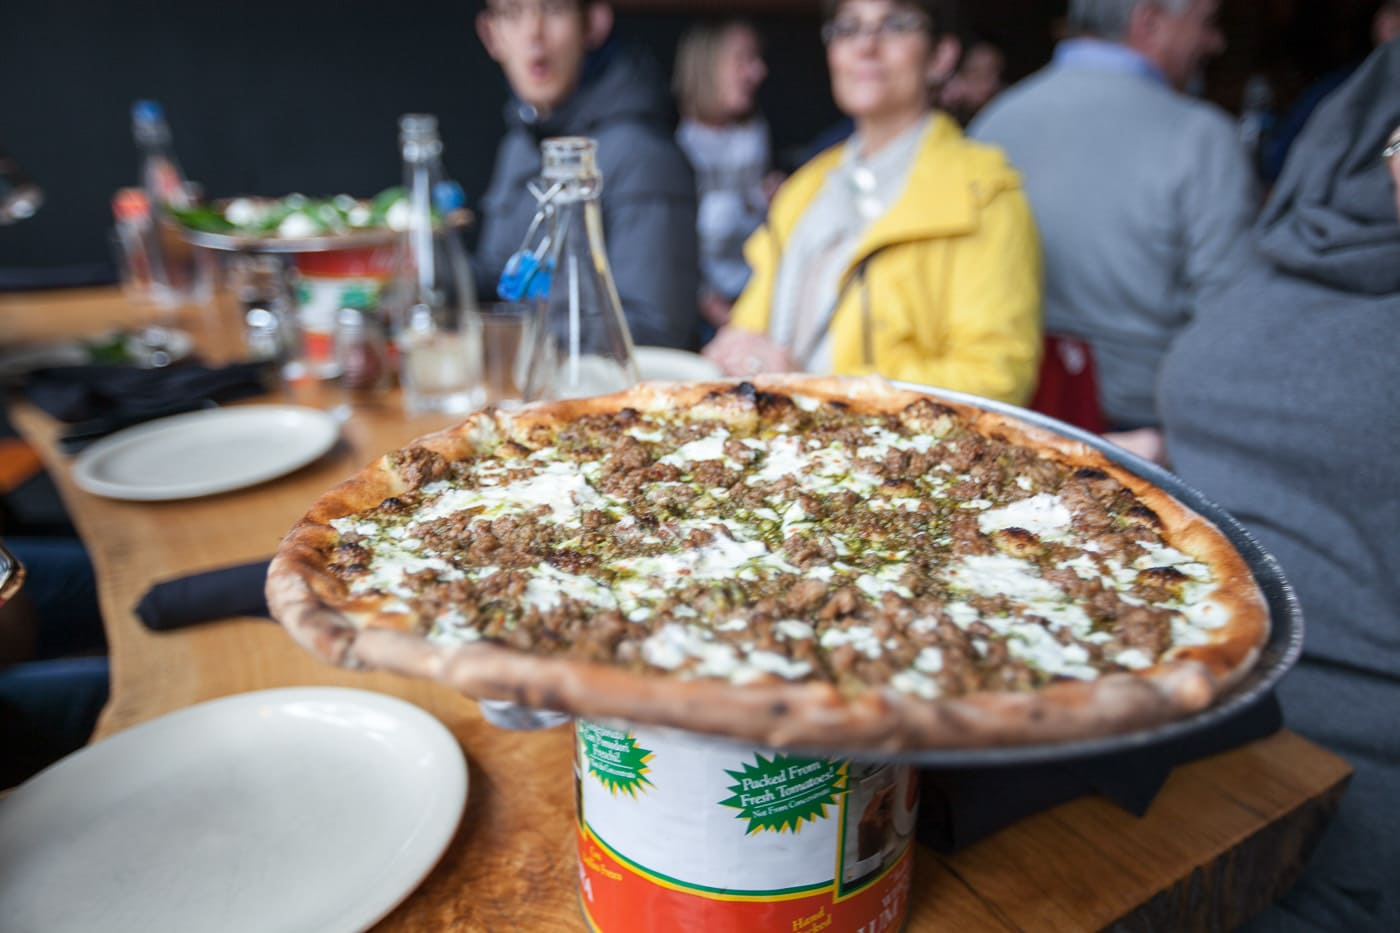 Pizza tour of Chicago with Chicago Pizza Tours - Pistachio Pesto pizza with pistachio pesto, berkshire sausage, burrata, and honey at Coalfire Pizza in Chicago